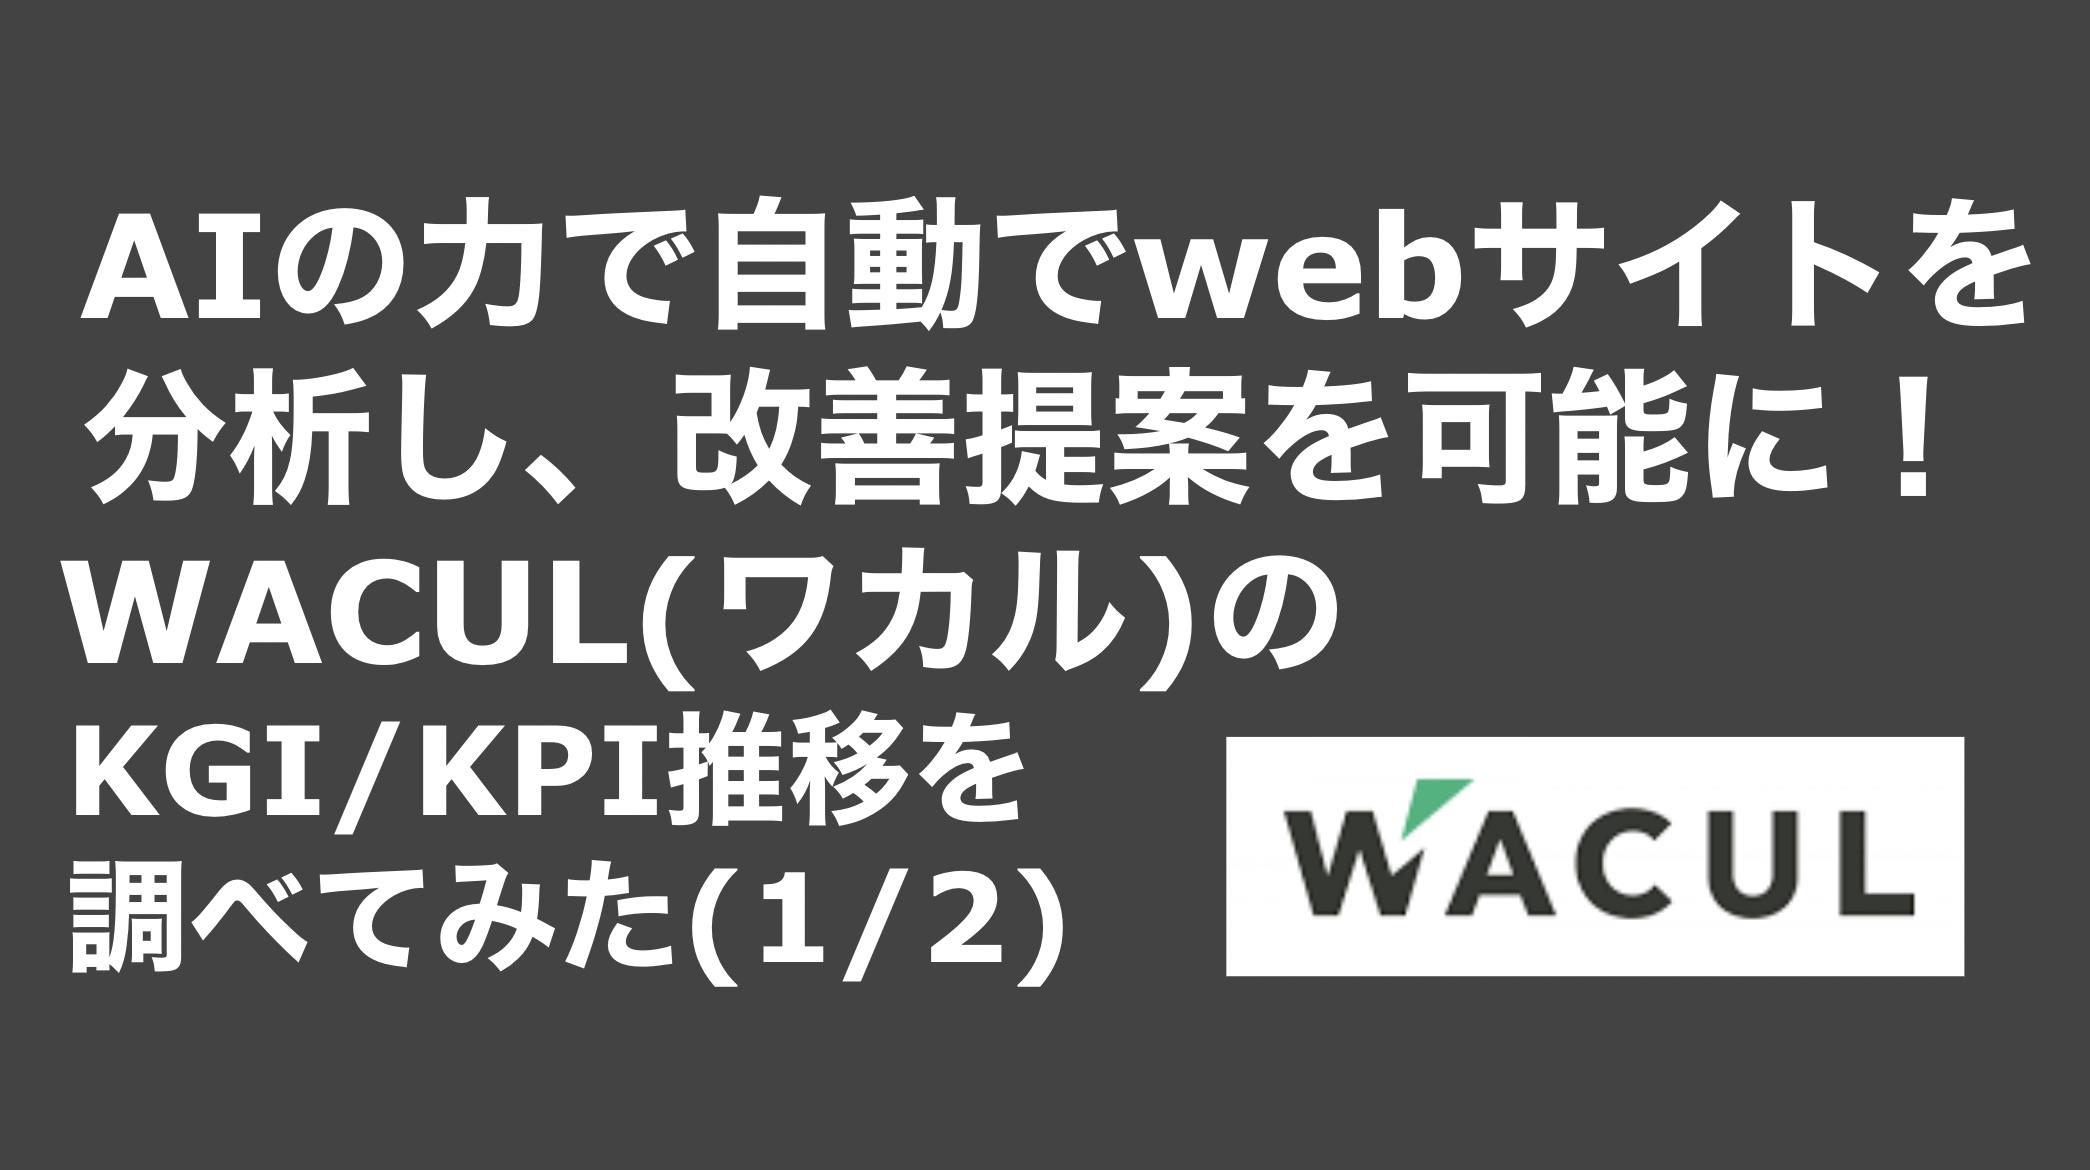 saaslife_ AIの力で自動でwebサイトを分析し、改善提案を可能に!WACUL(ワカル)のKGI/KPI推移を調べてみた(1/2)